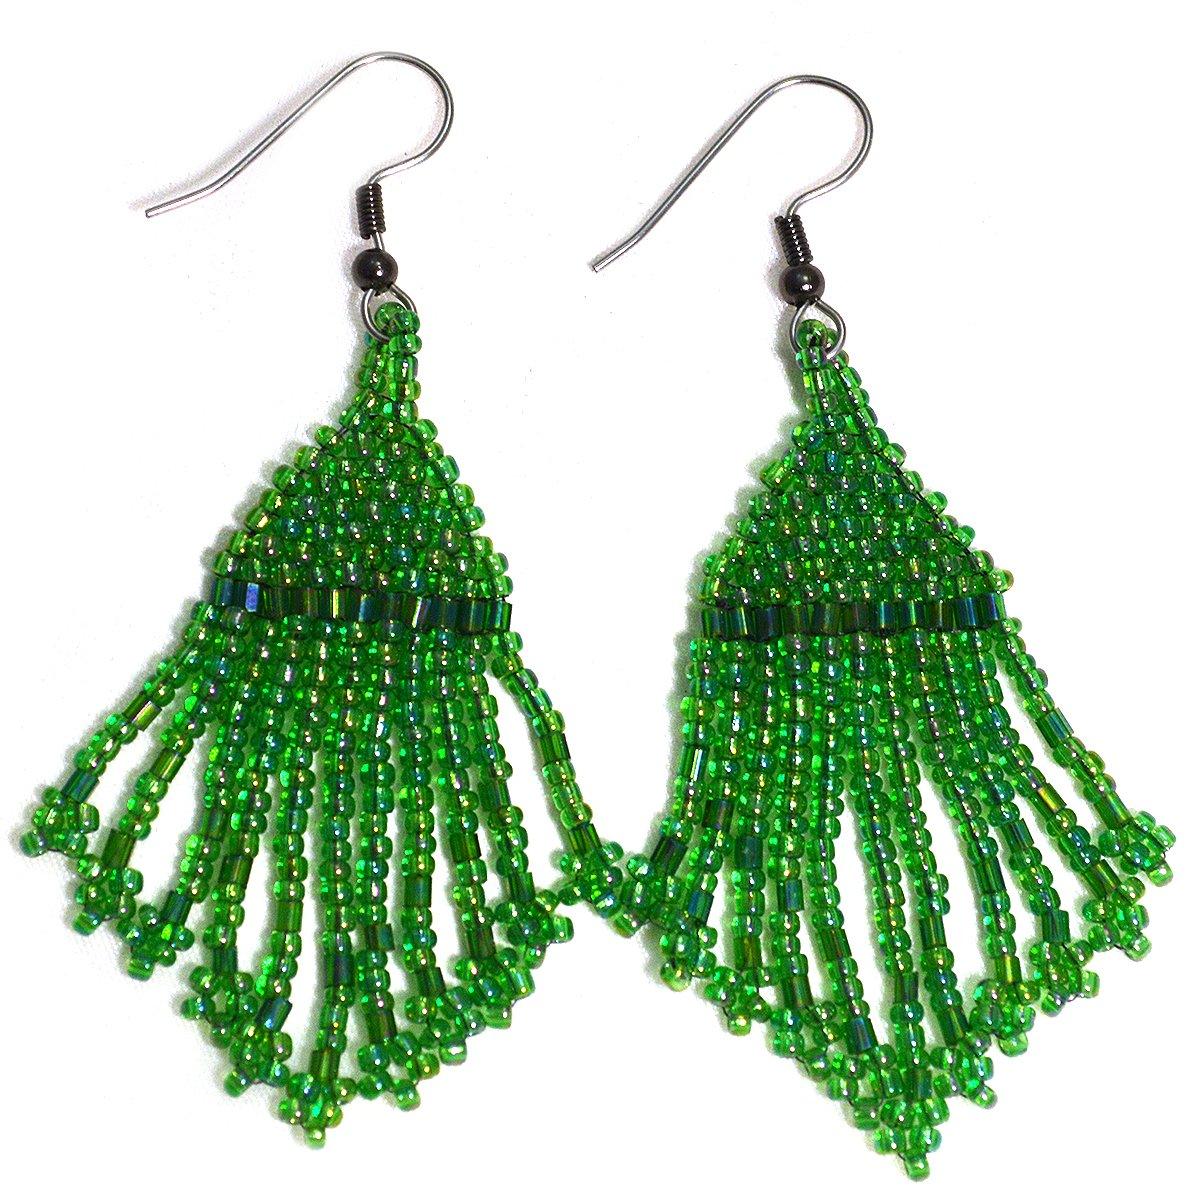 Triangle Flame Earrings Native American style boho earrings seed bead yoga jewelry tribal earrings beaded fringe earrings festival earrings